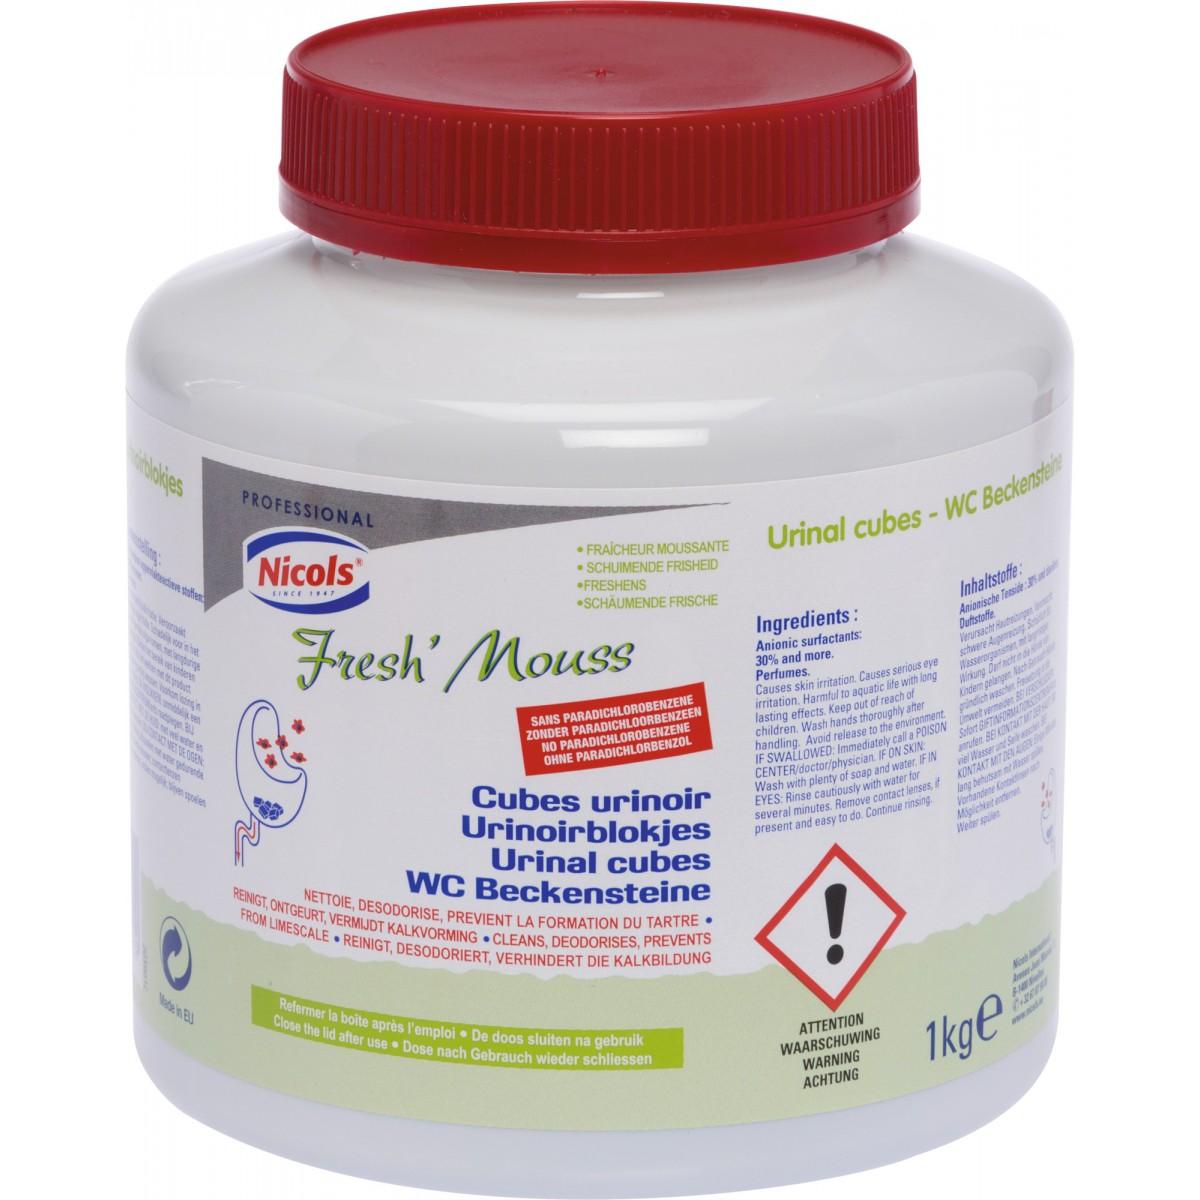 Cube urinoir fresh'mouss Nicols - Pot 1 kg - Bloc 30 g